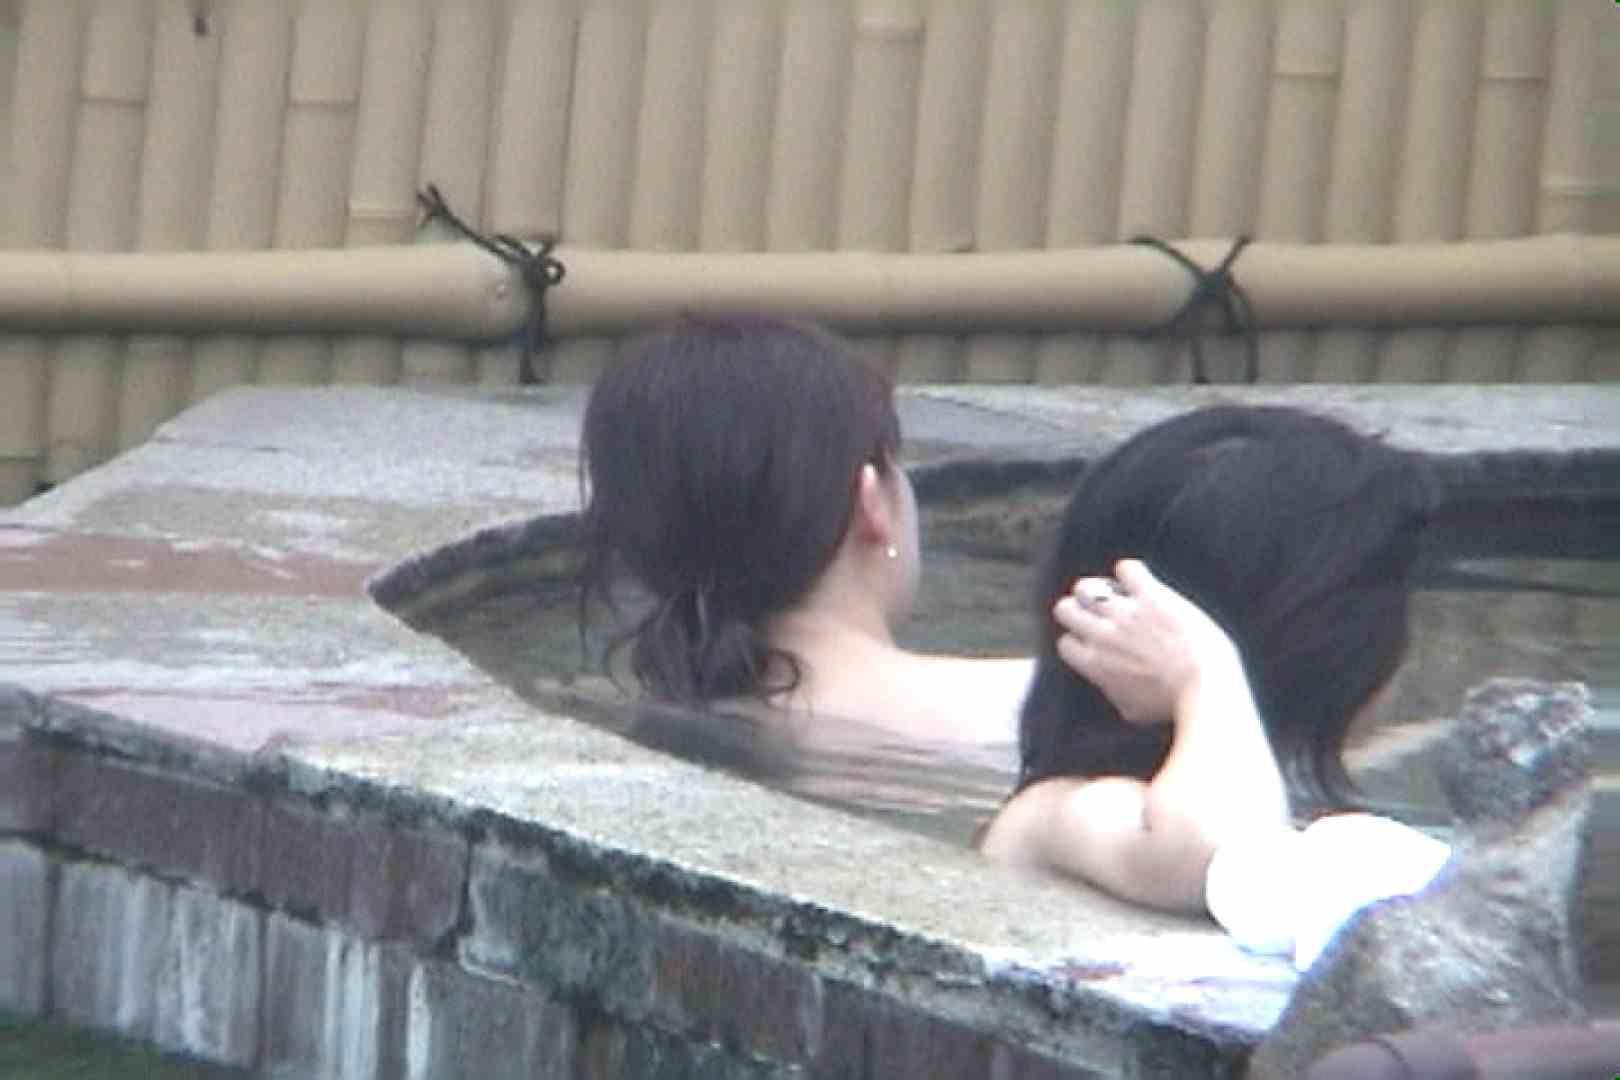 Aquaな露天風呂Vol.79【VIP限定】 盗撮 | HなOL  100pic 21